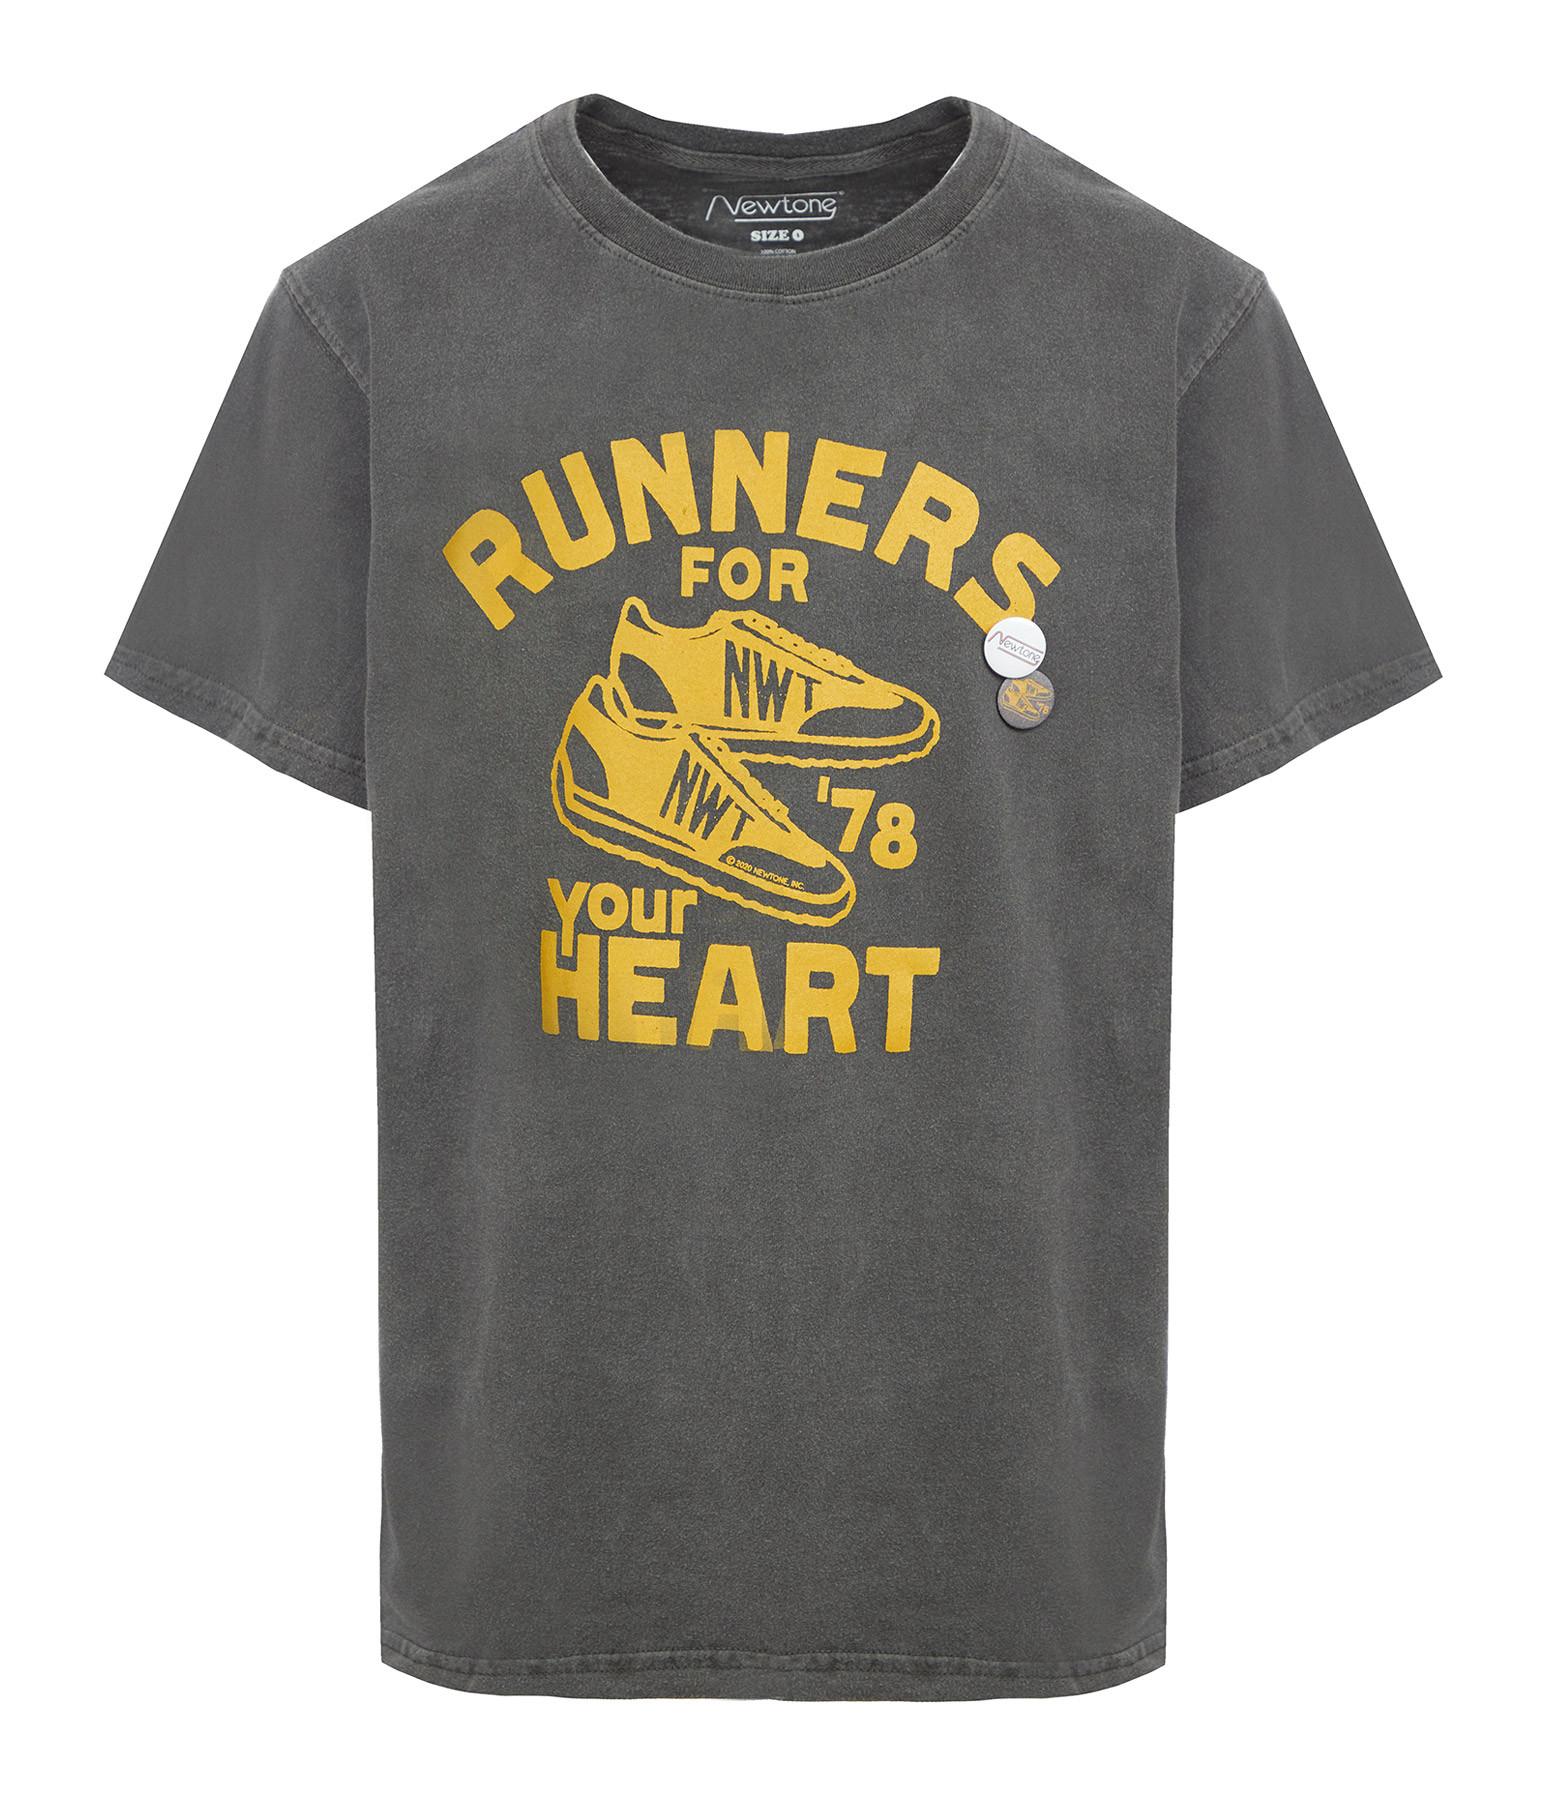 NEWTONE - Tee-shirt Trucker Hearth Coton Pepper